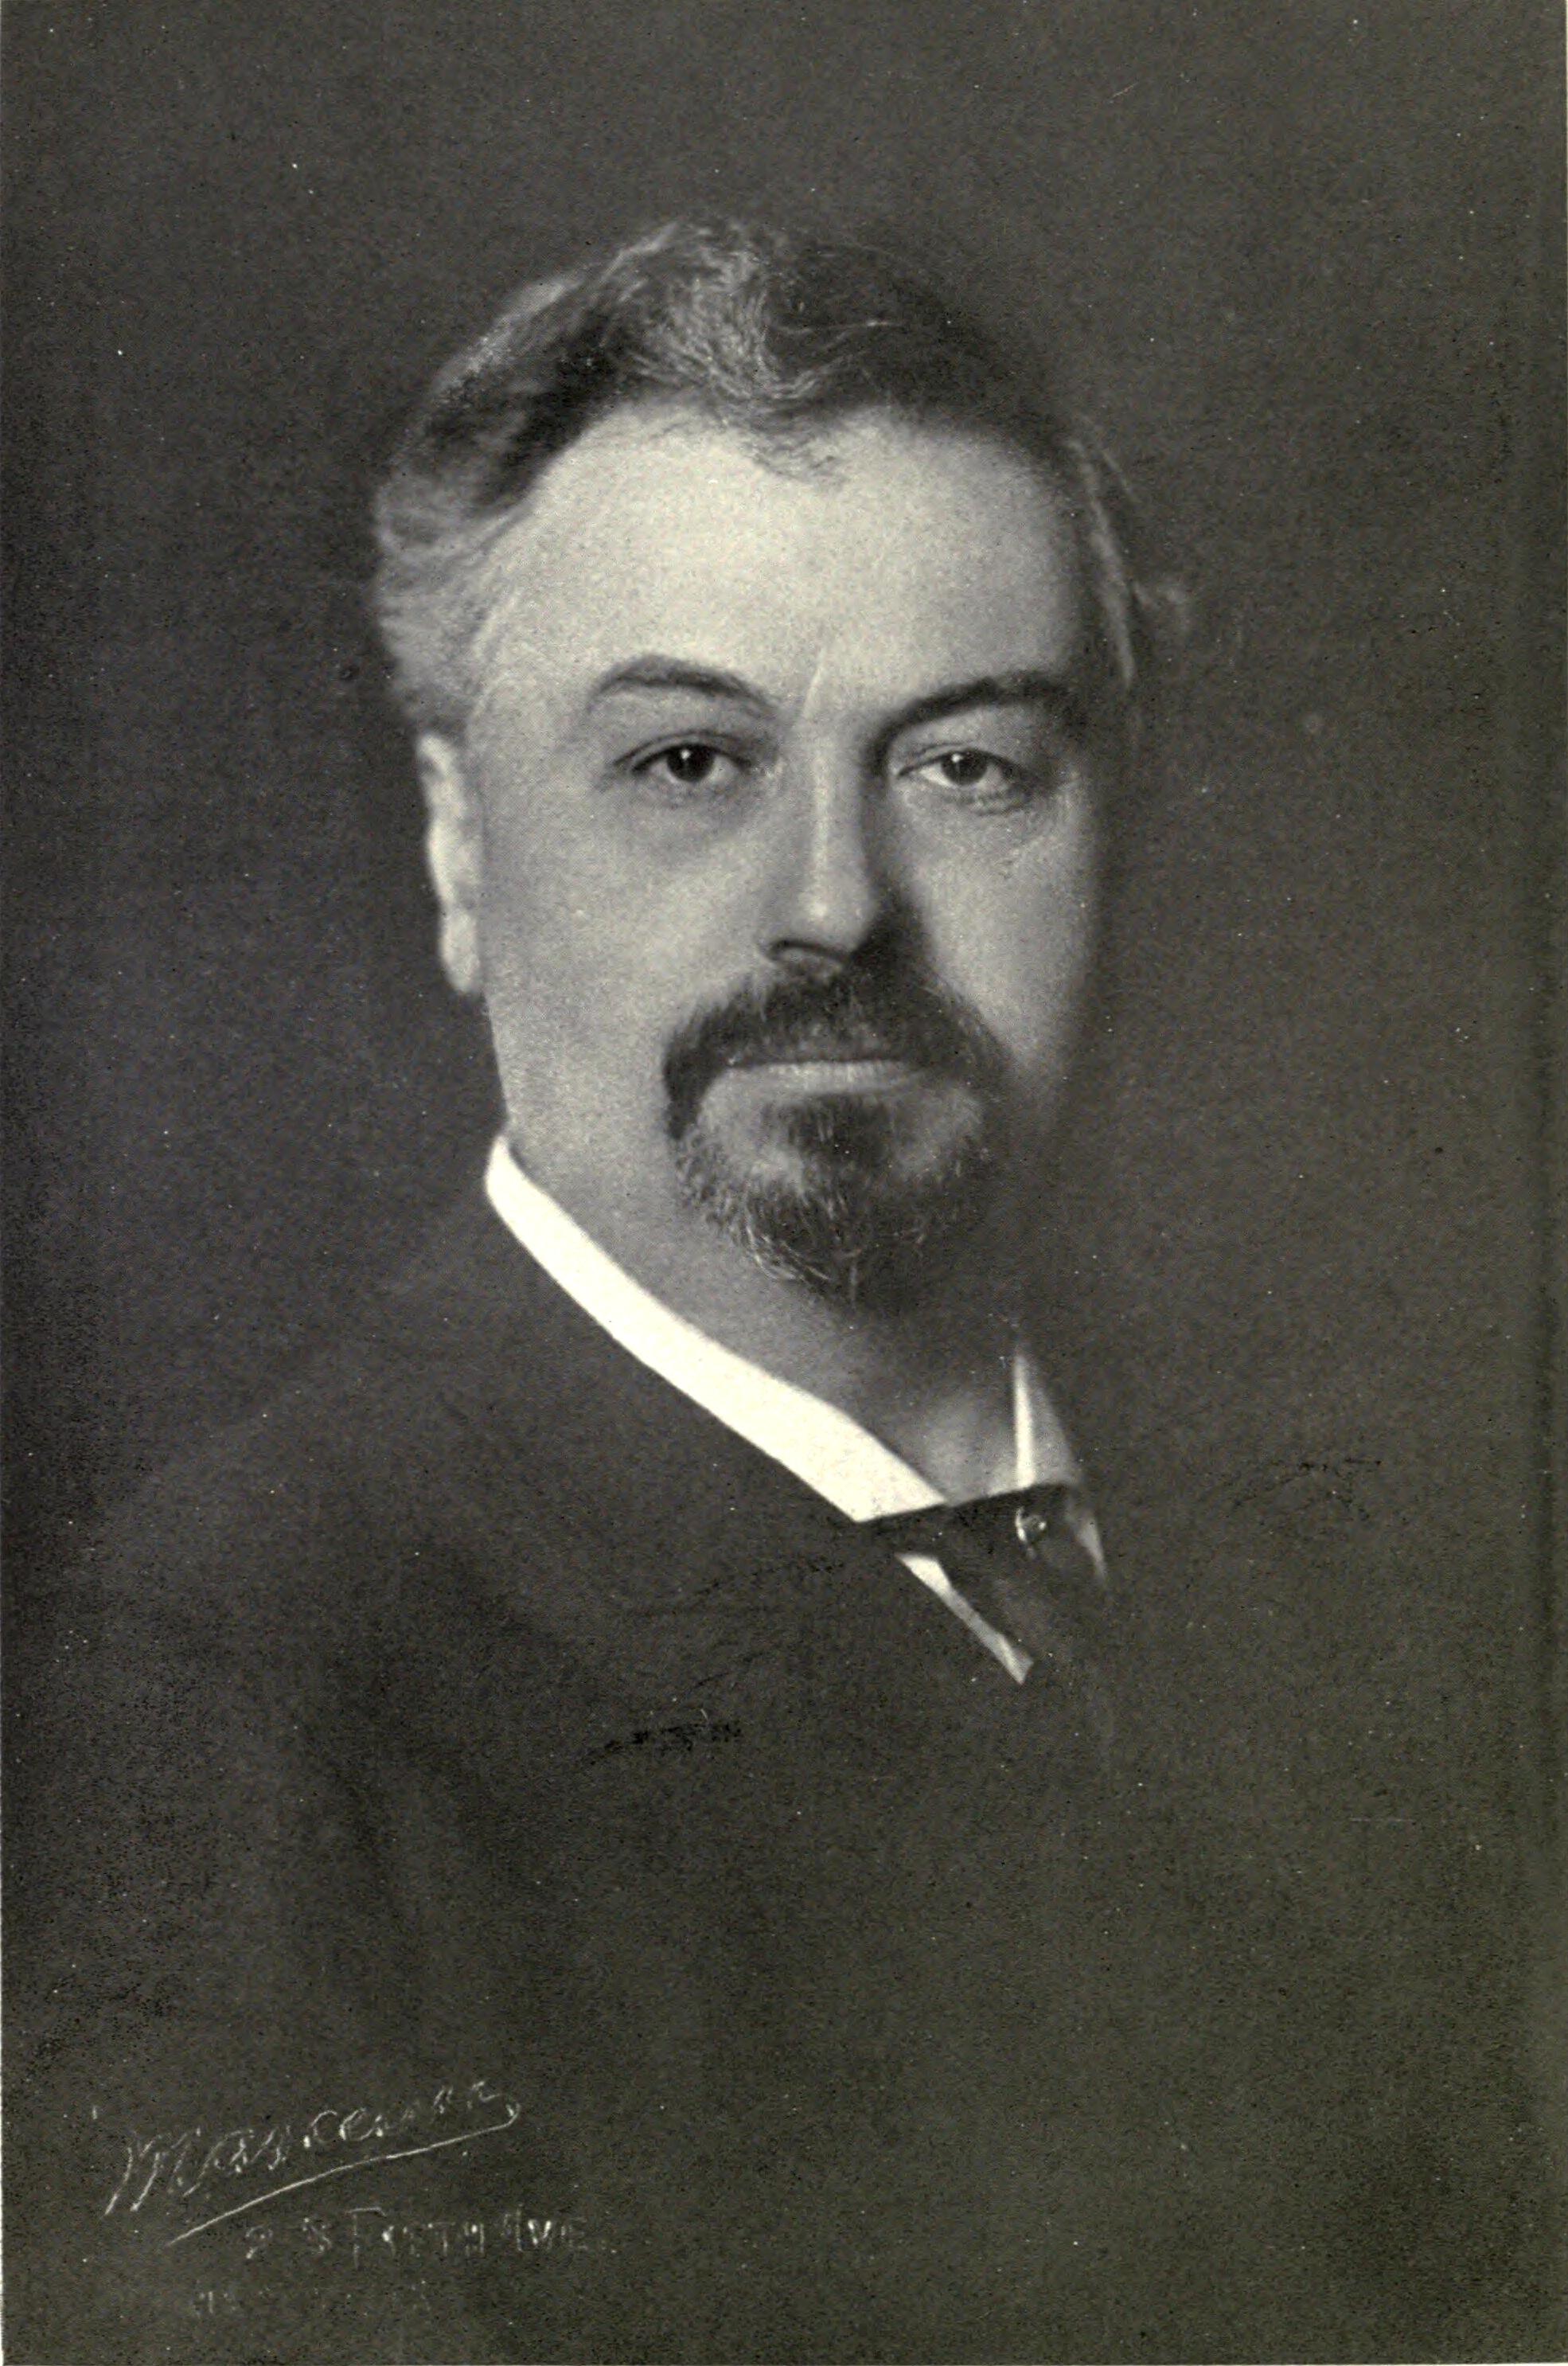 Osar Hammerstein I